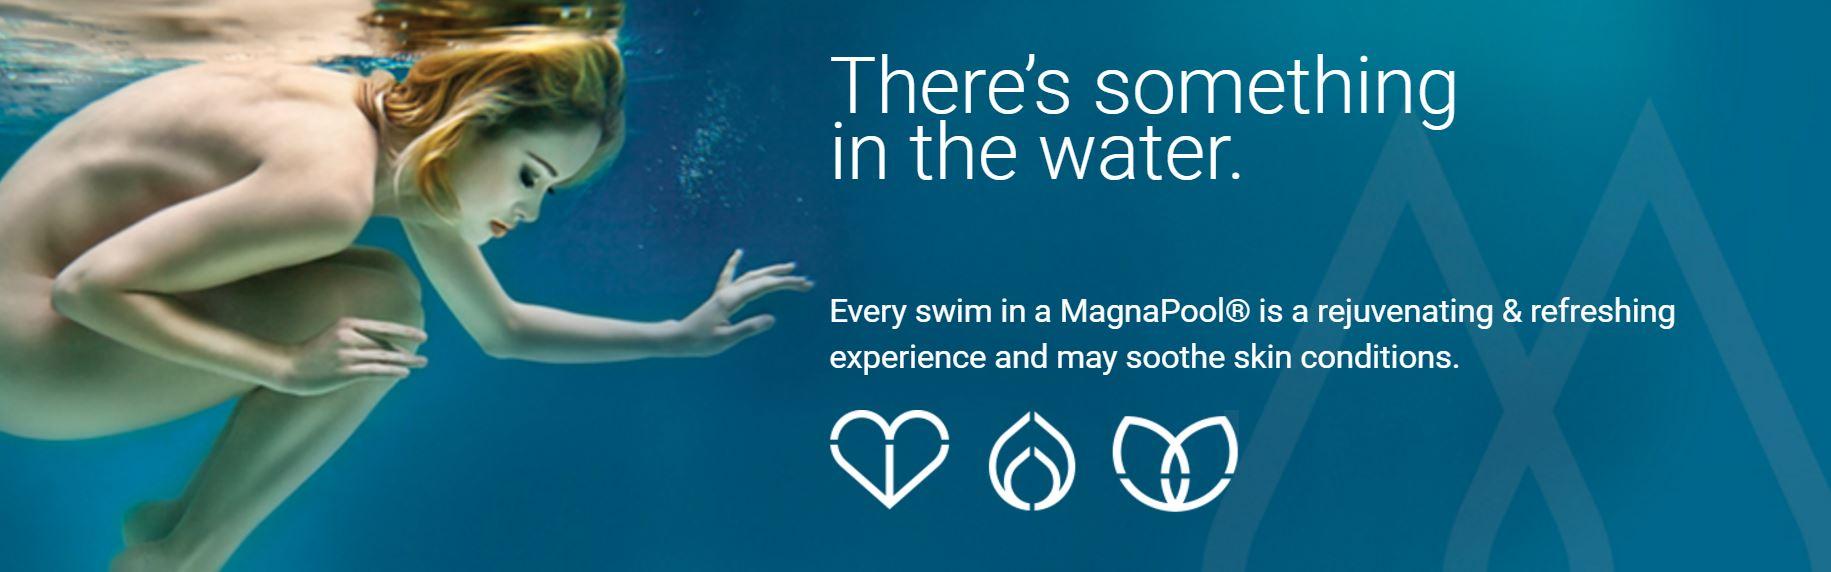 magna-pool-1.jpg